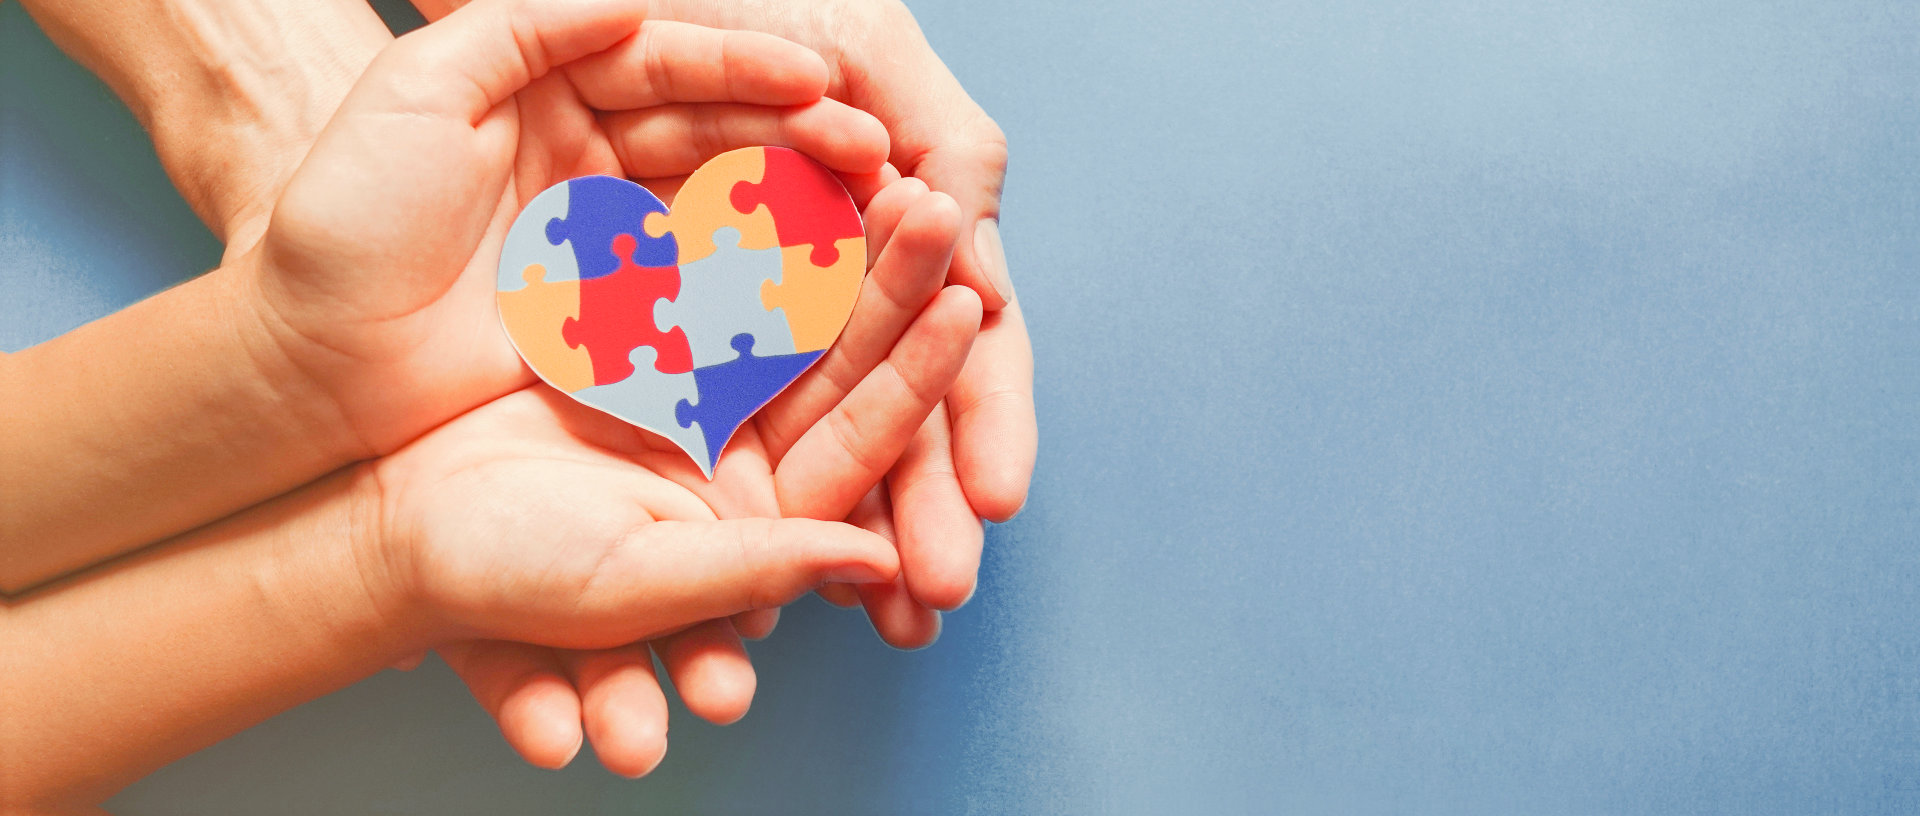 heart puzzle piece